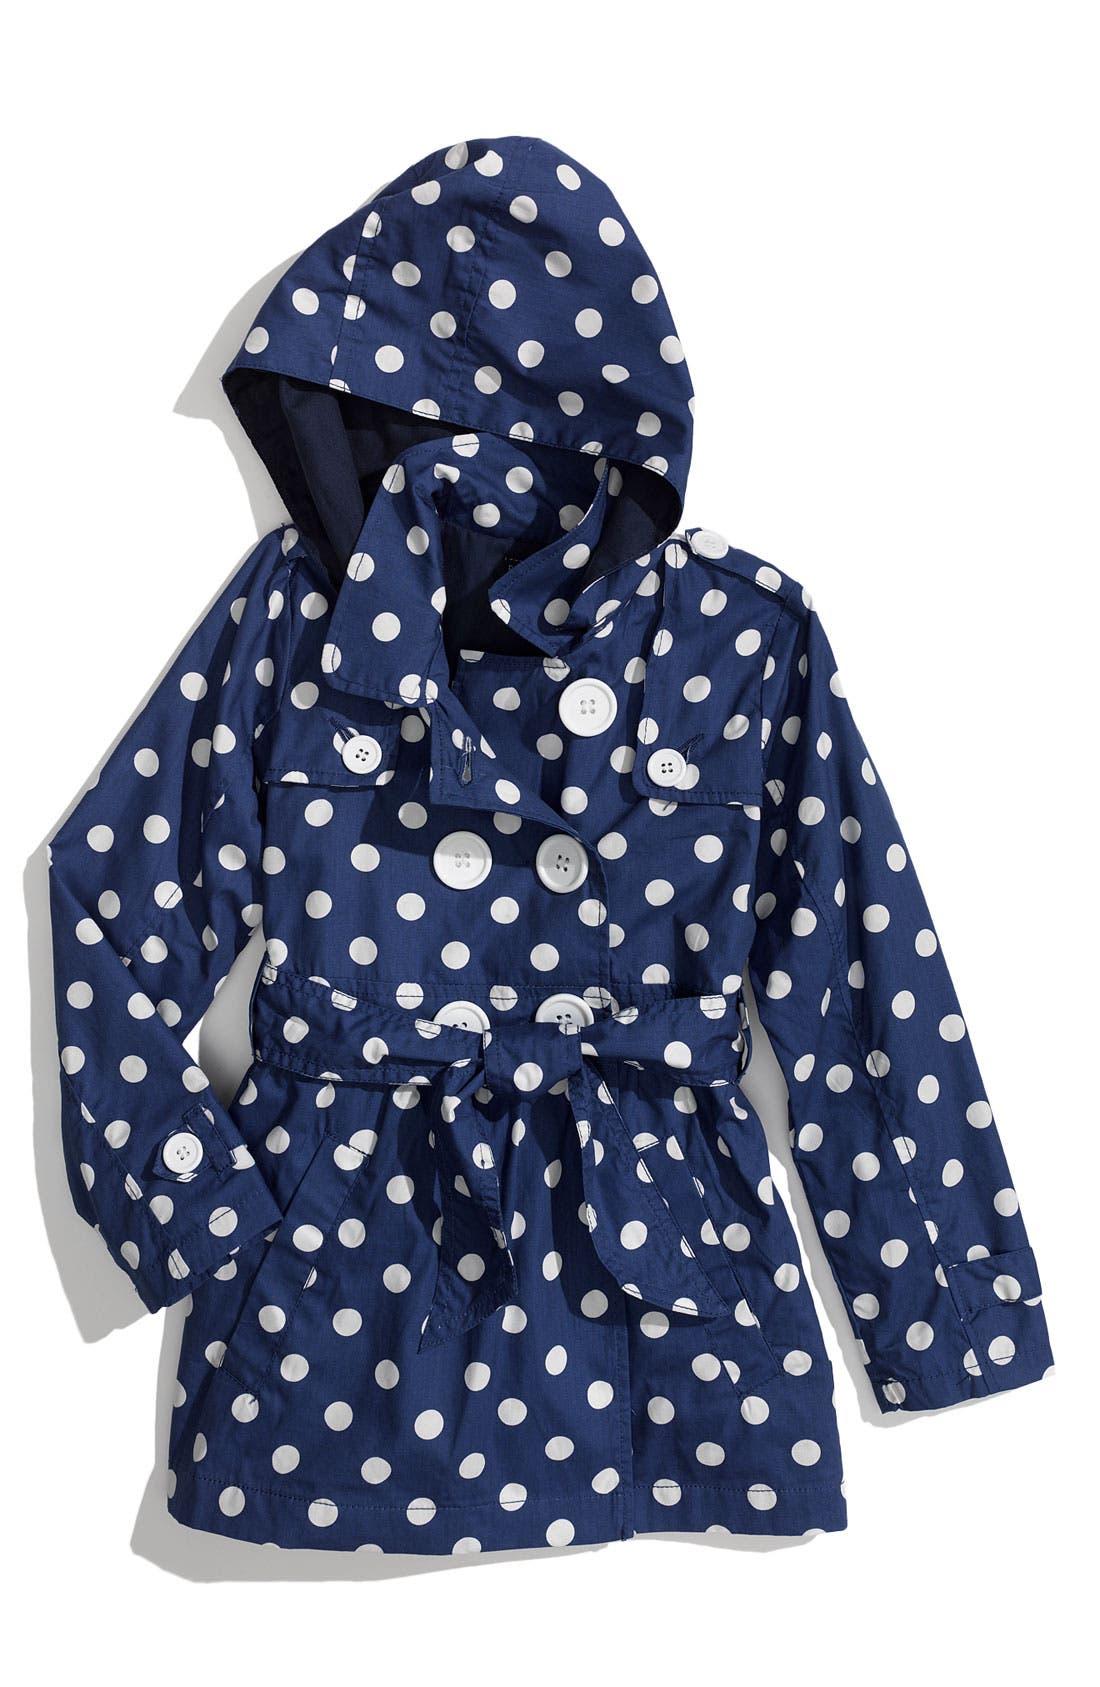 Main Image - Pumpkin Patch 'Spotty' Print Trench Coat (Little Girls)